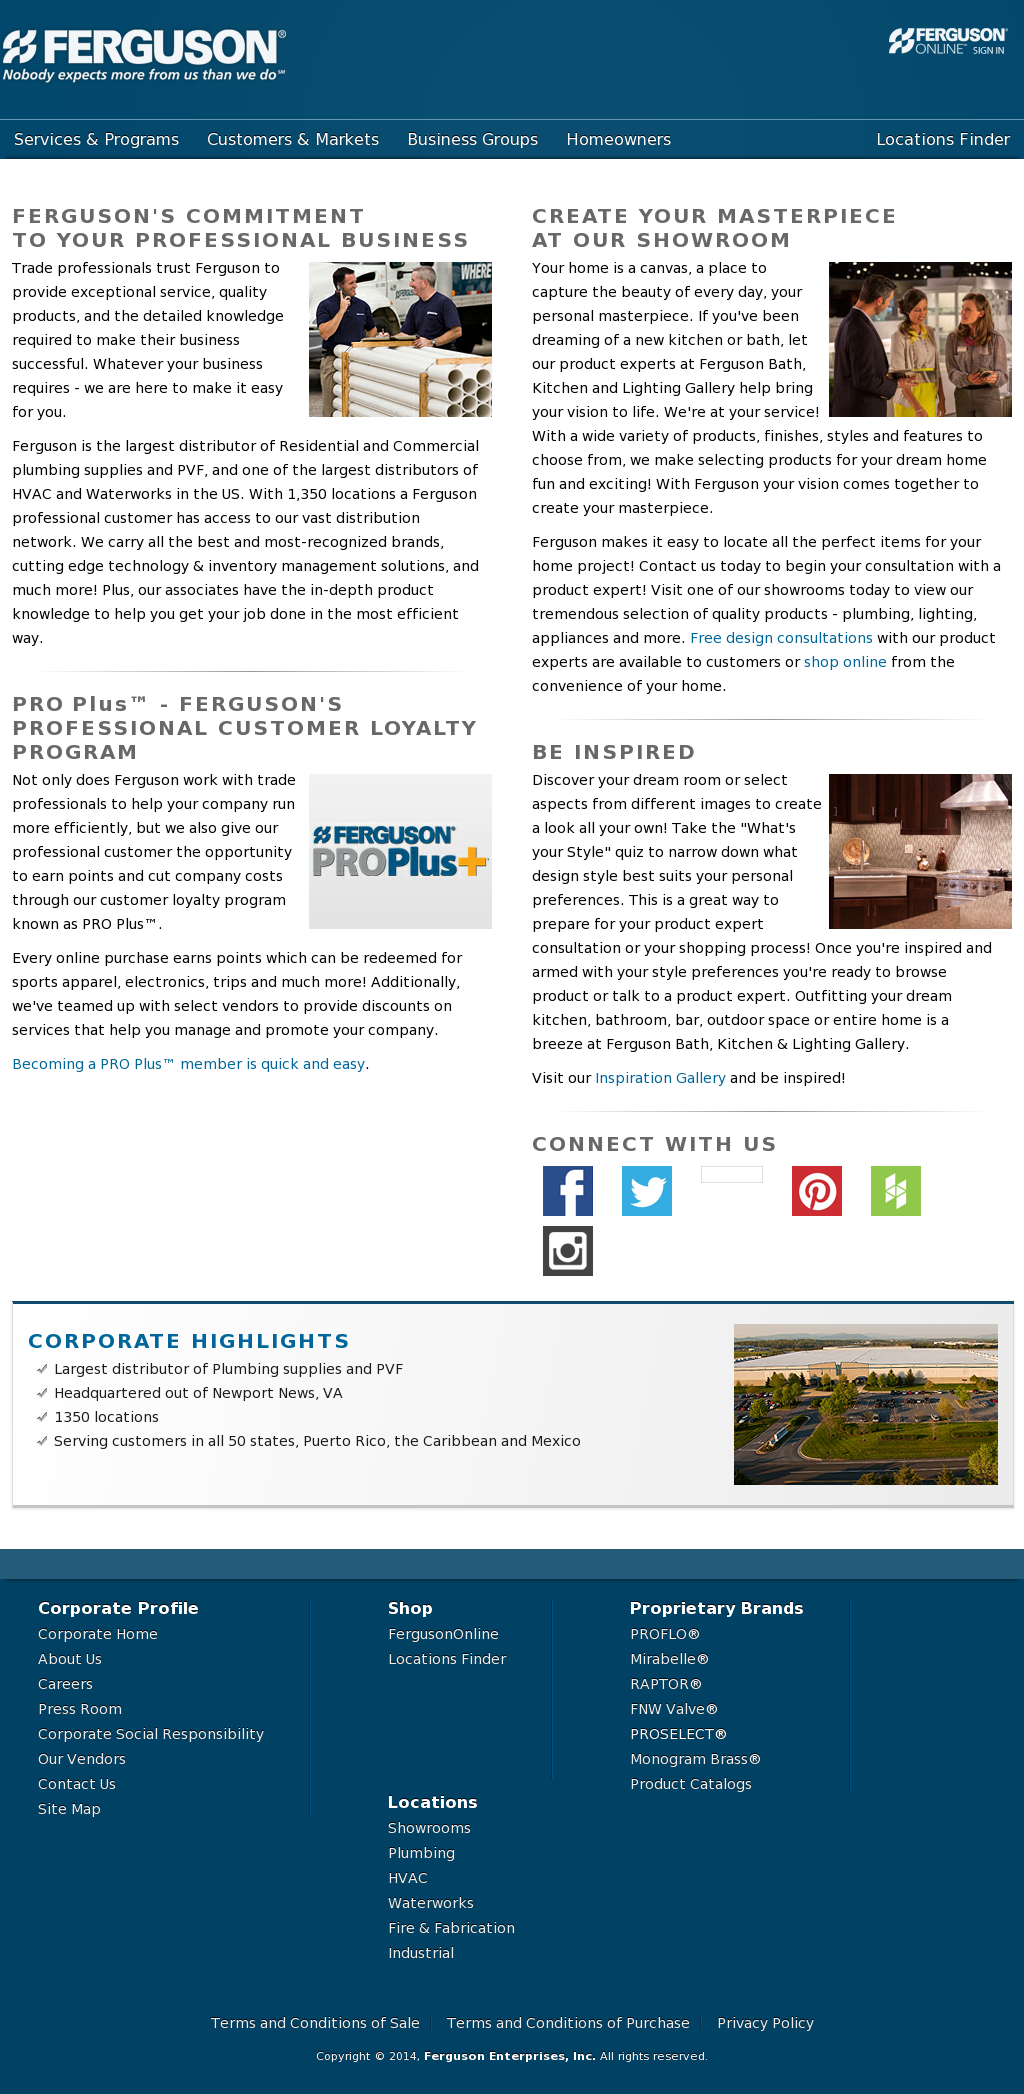 Ferguson Enterprises Company Profile - Revenue, Number of ...